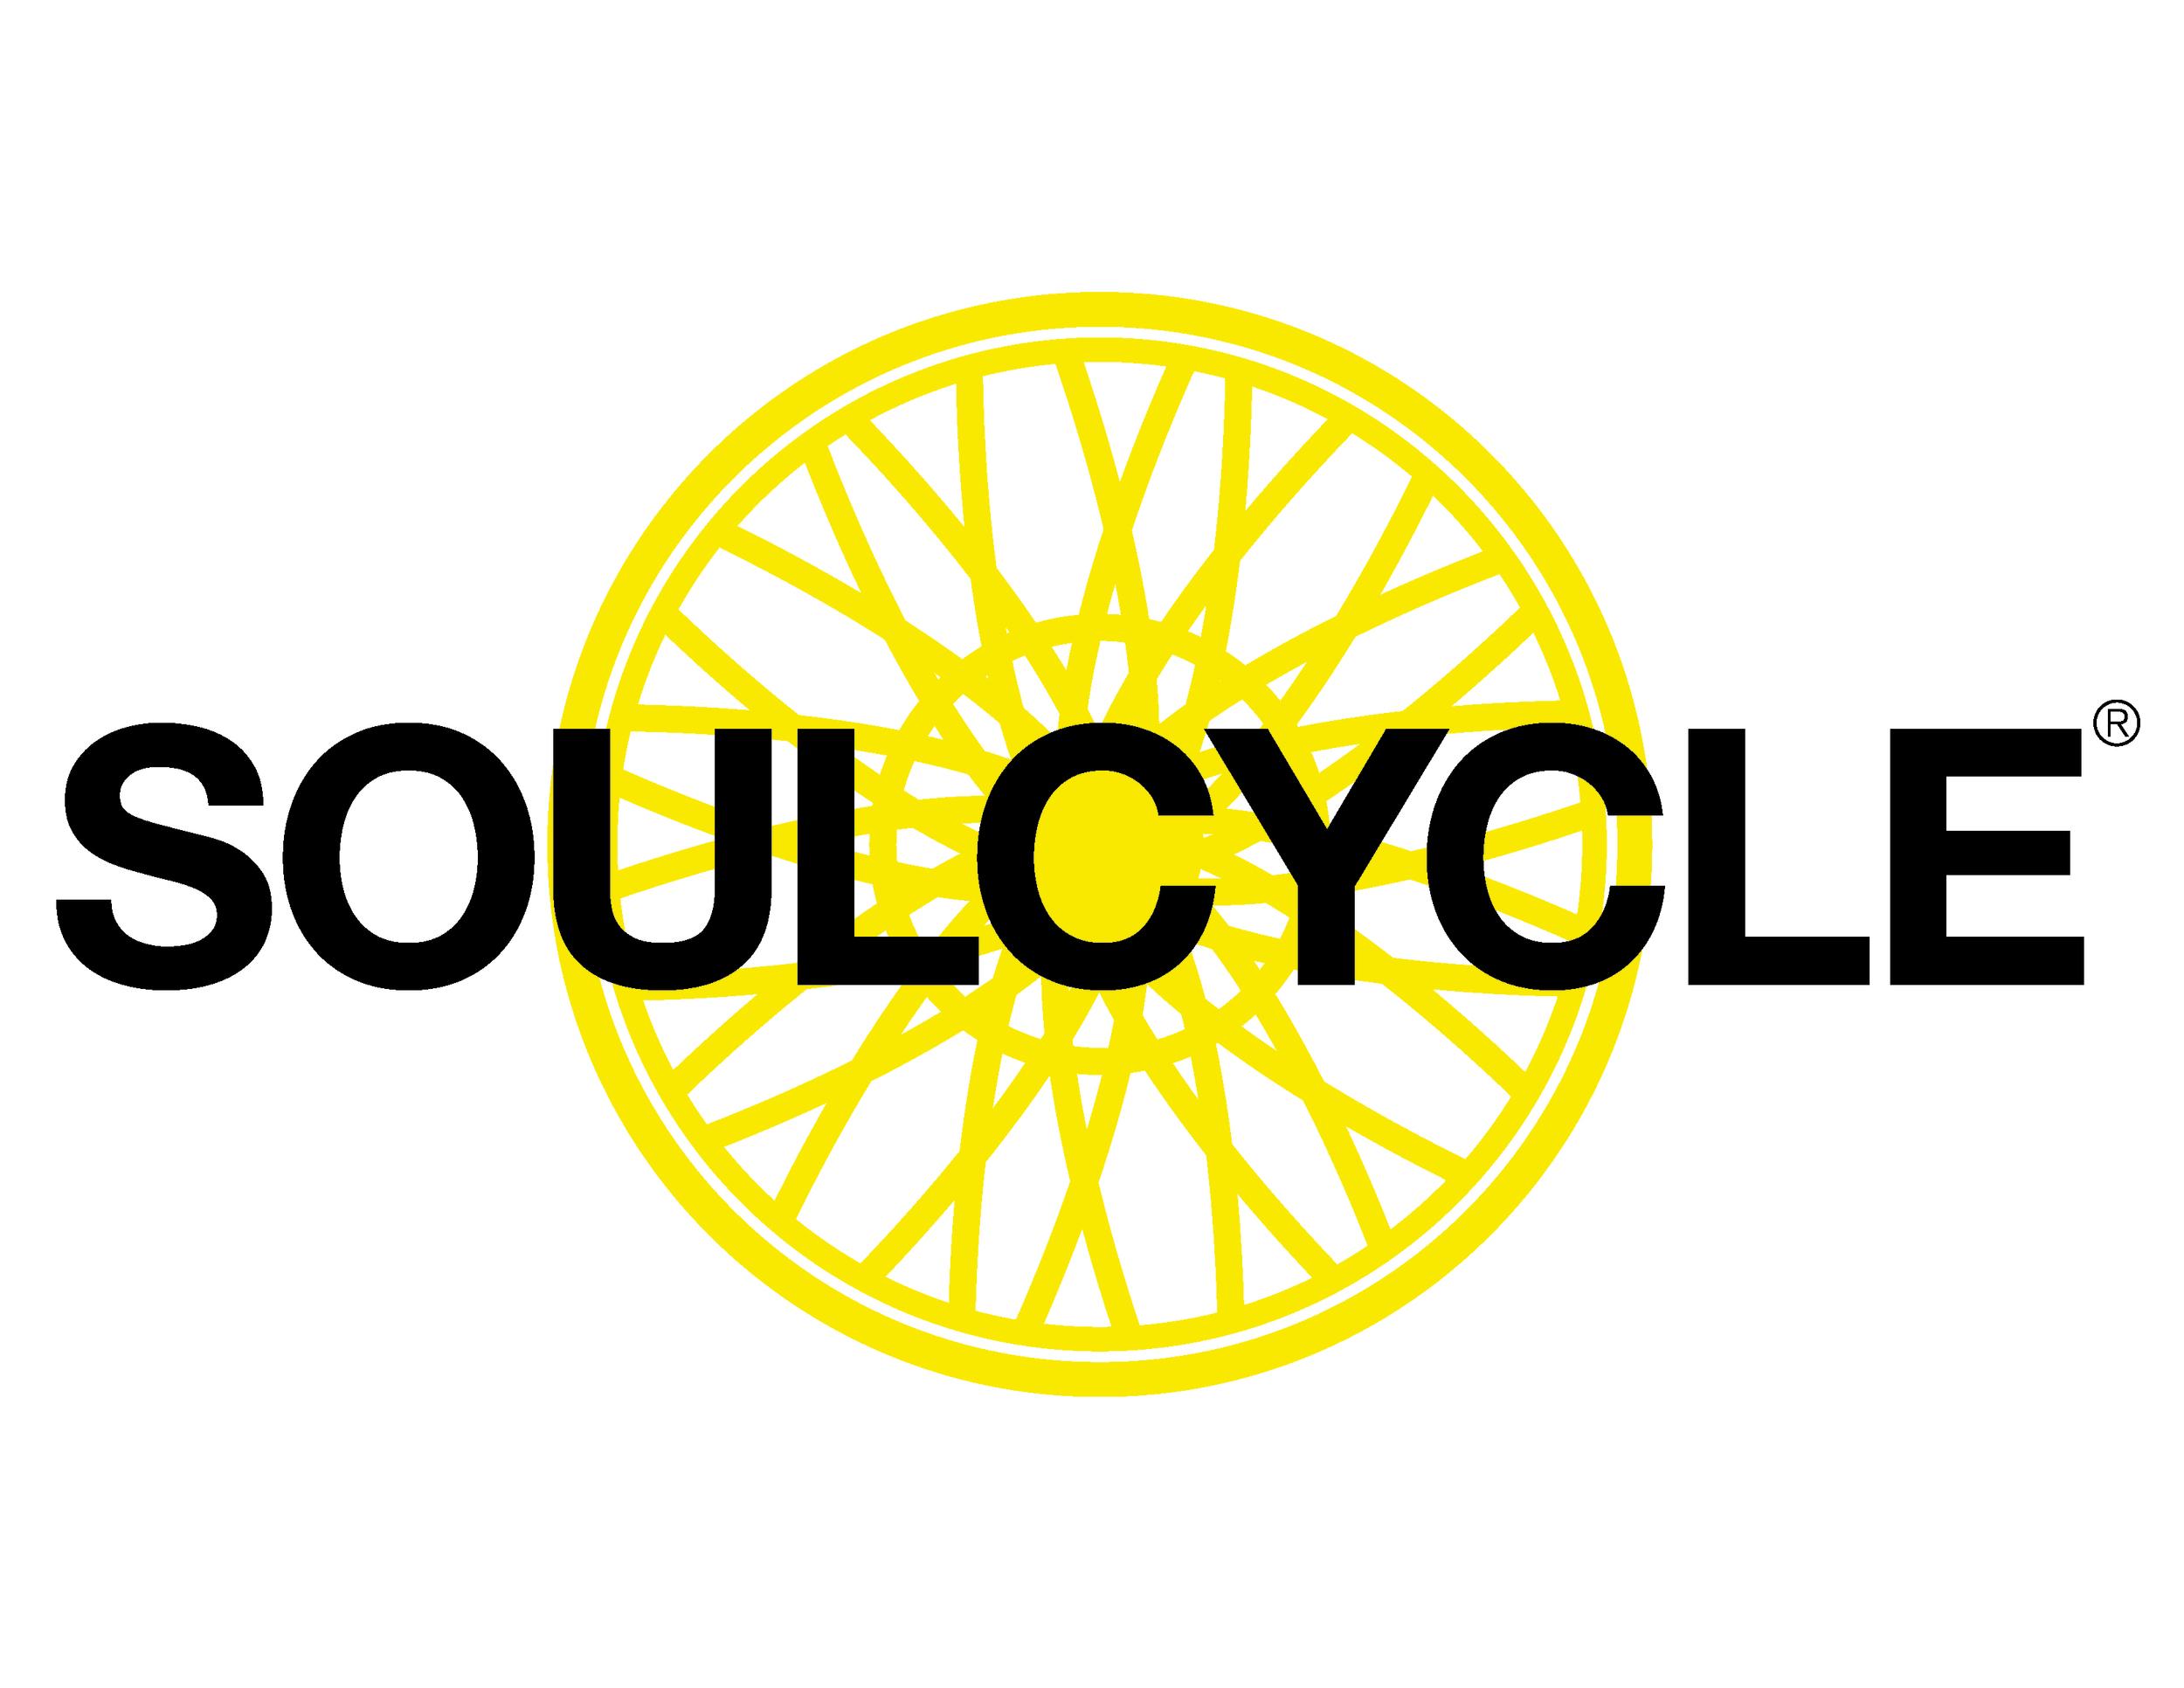 SoulCycle at Malibu Village